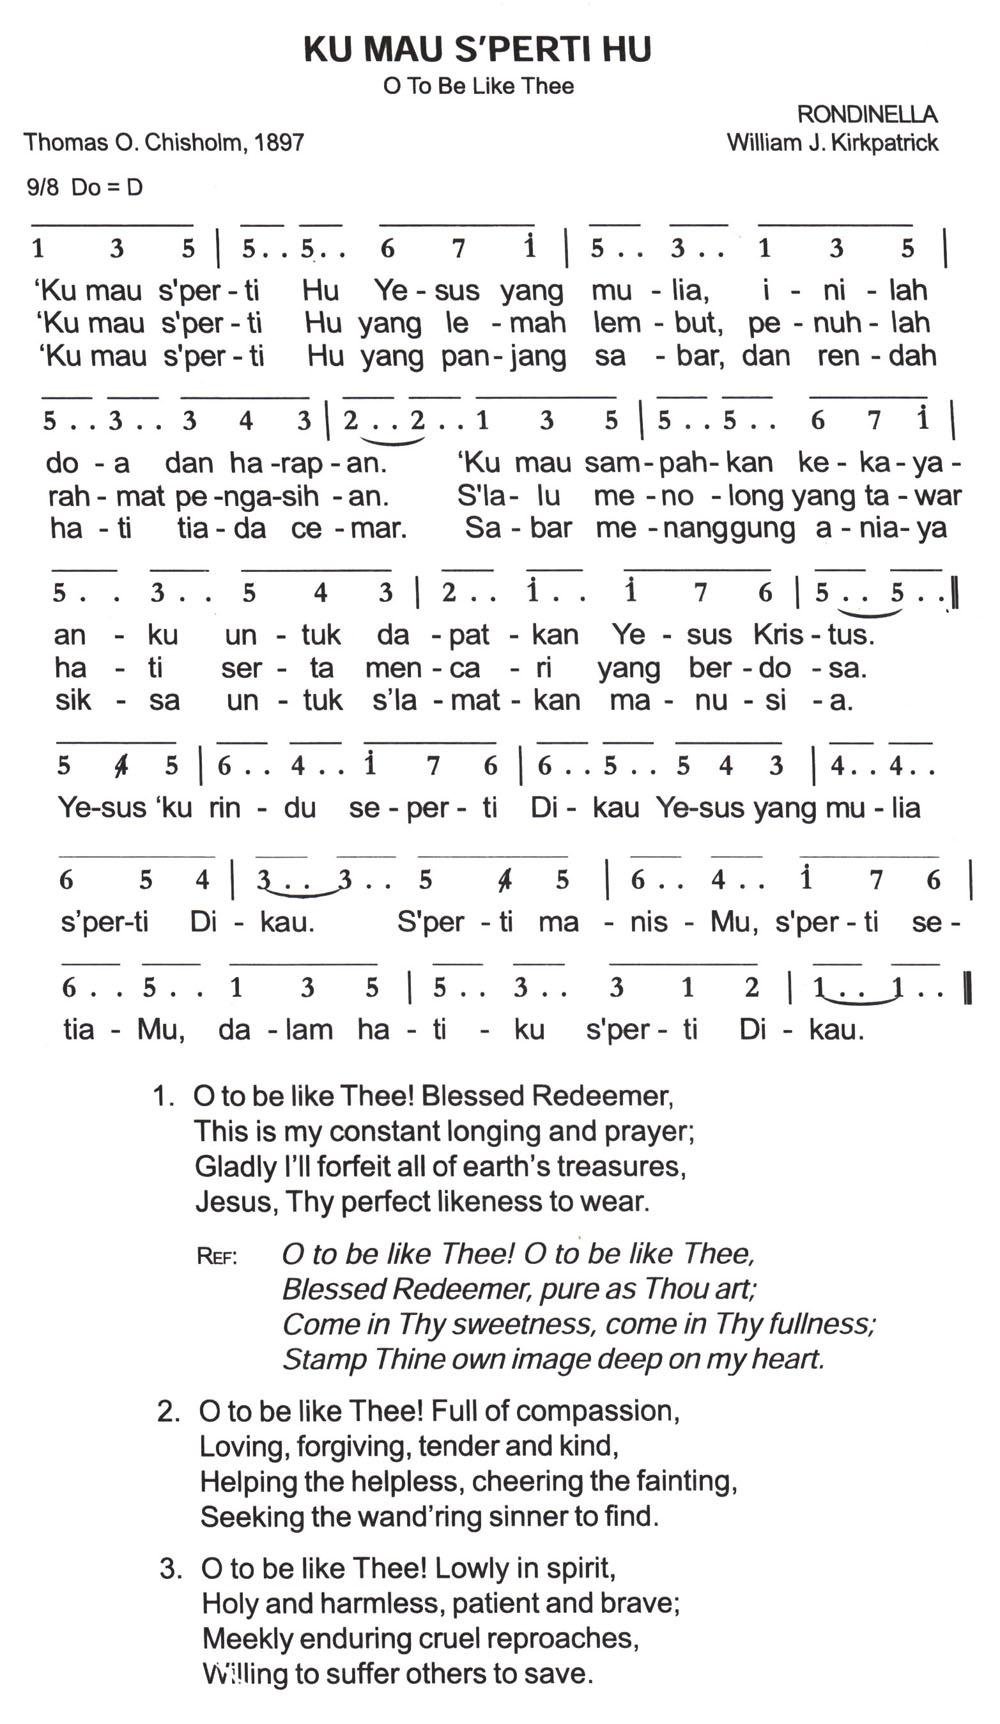 Lirik Ku Mau Cinta Yesus : lirik, cinta, yesus, Excellent, Future, Rejoice, Evermore